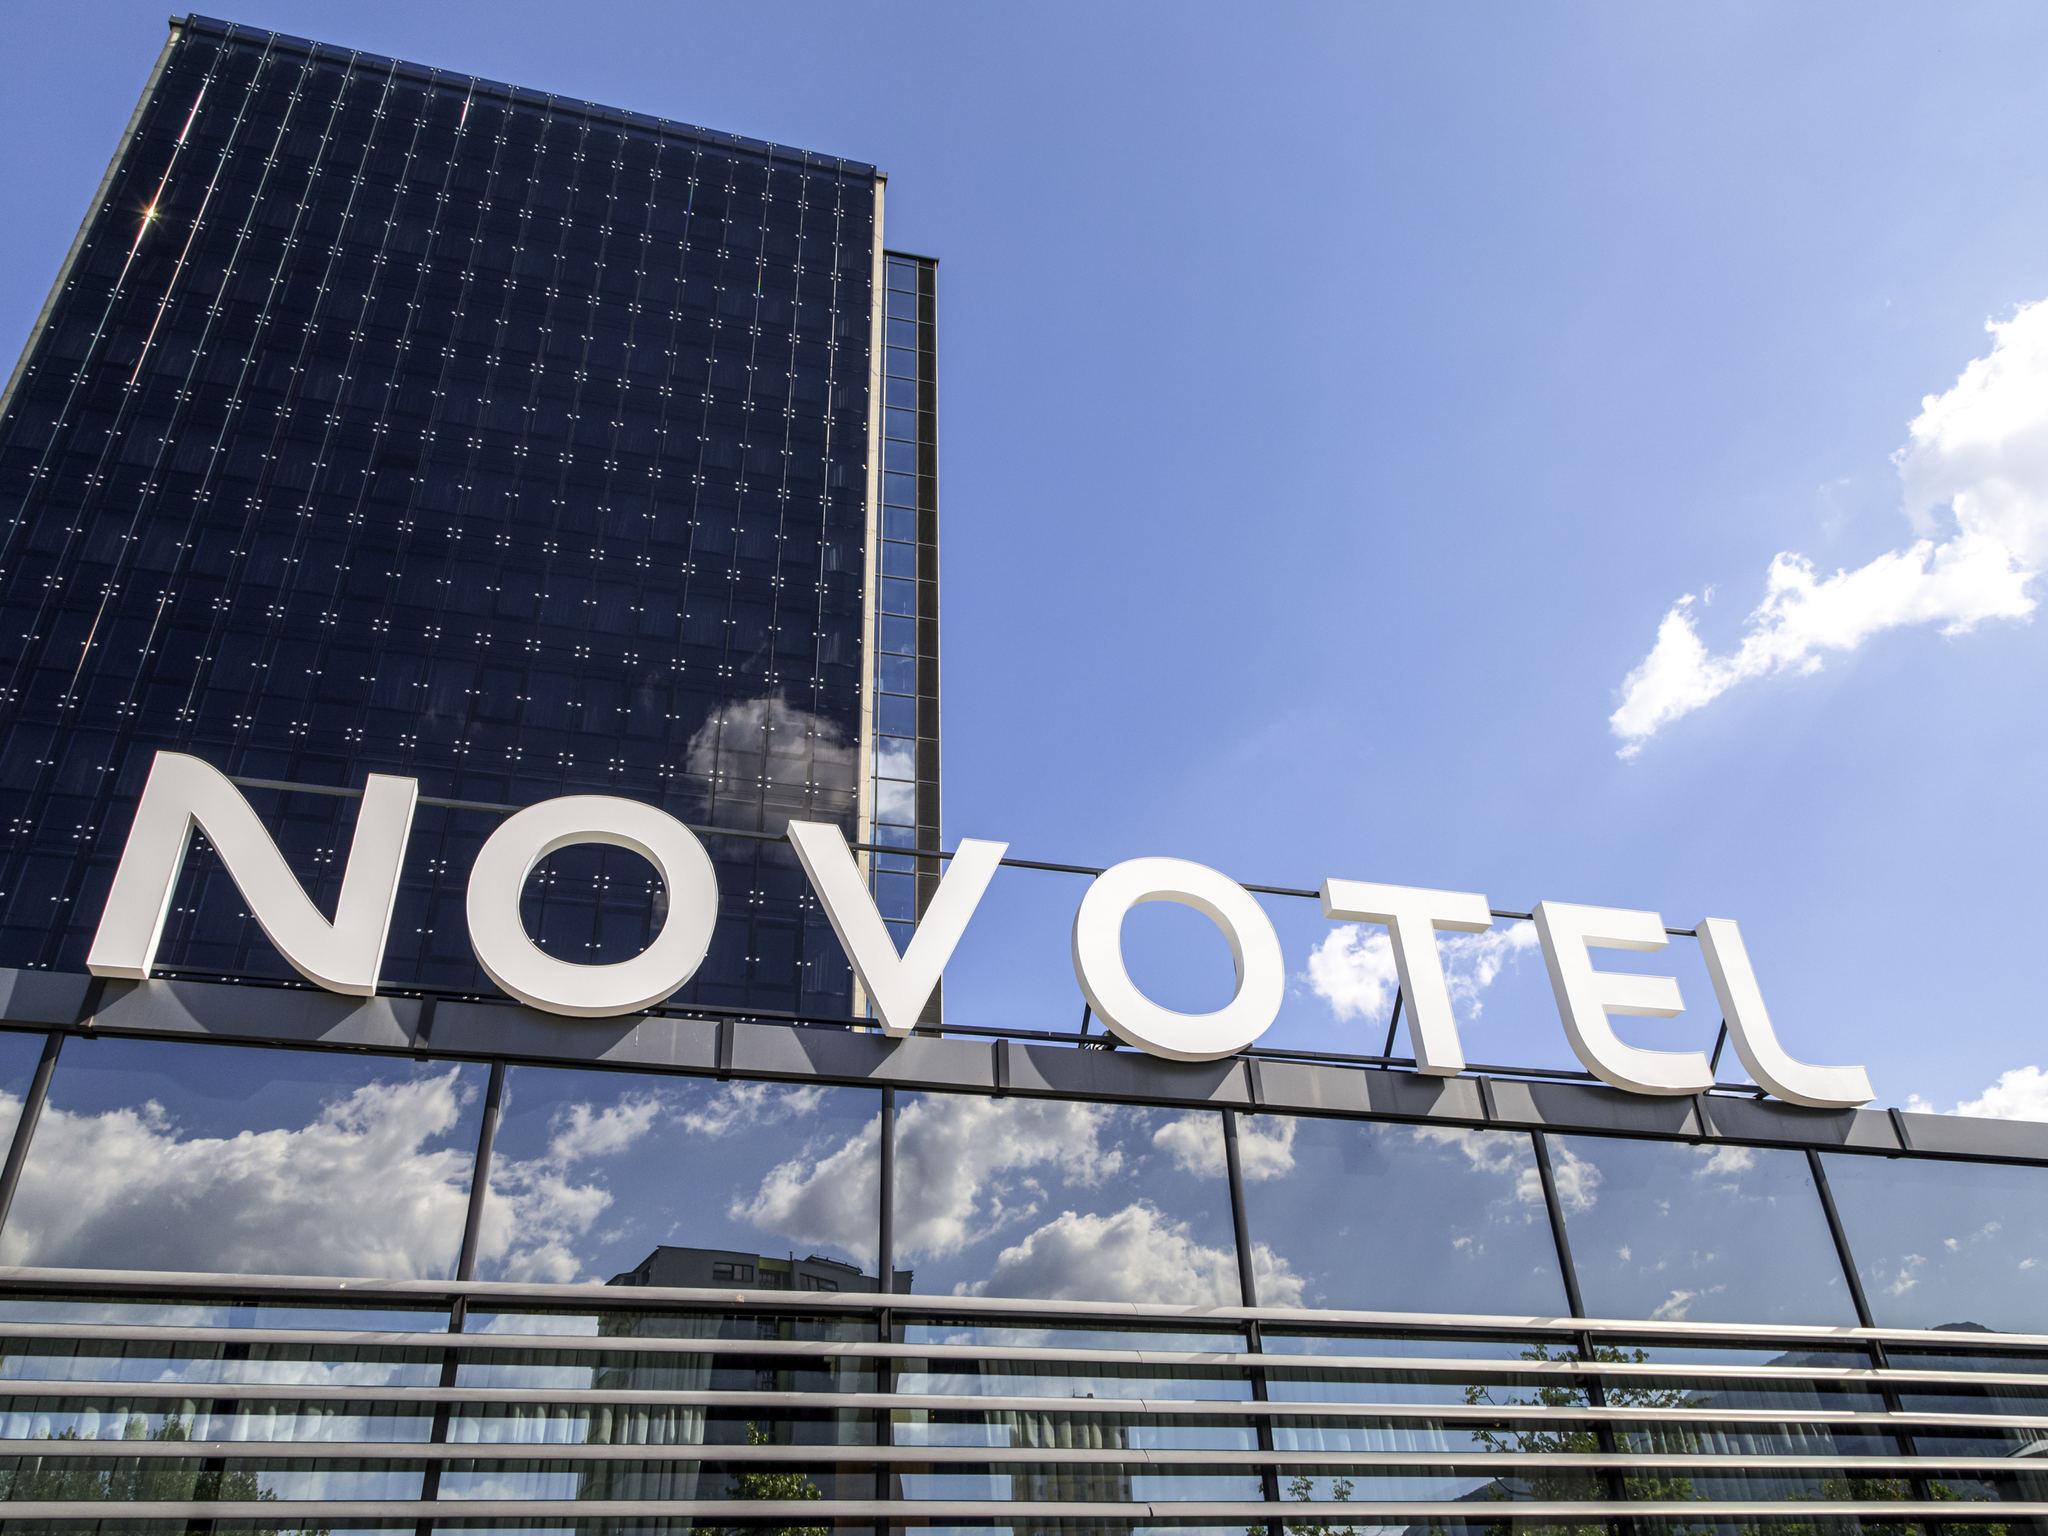 Novotel Hotel Rooms